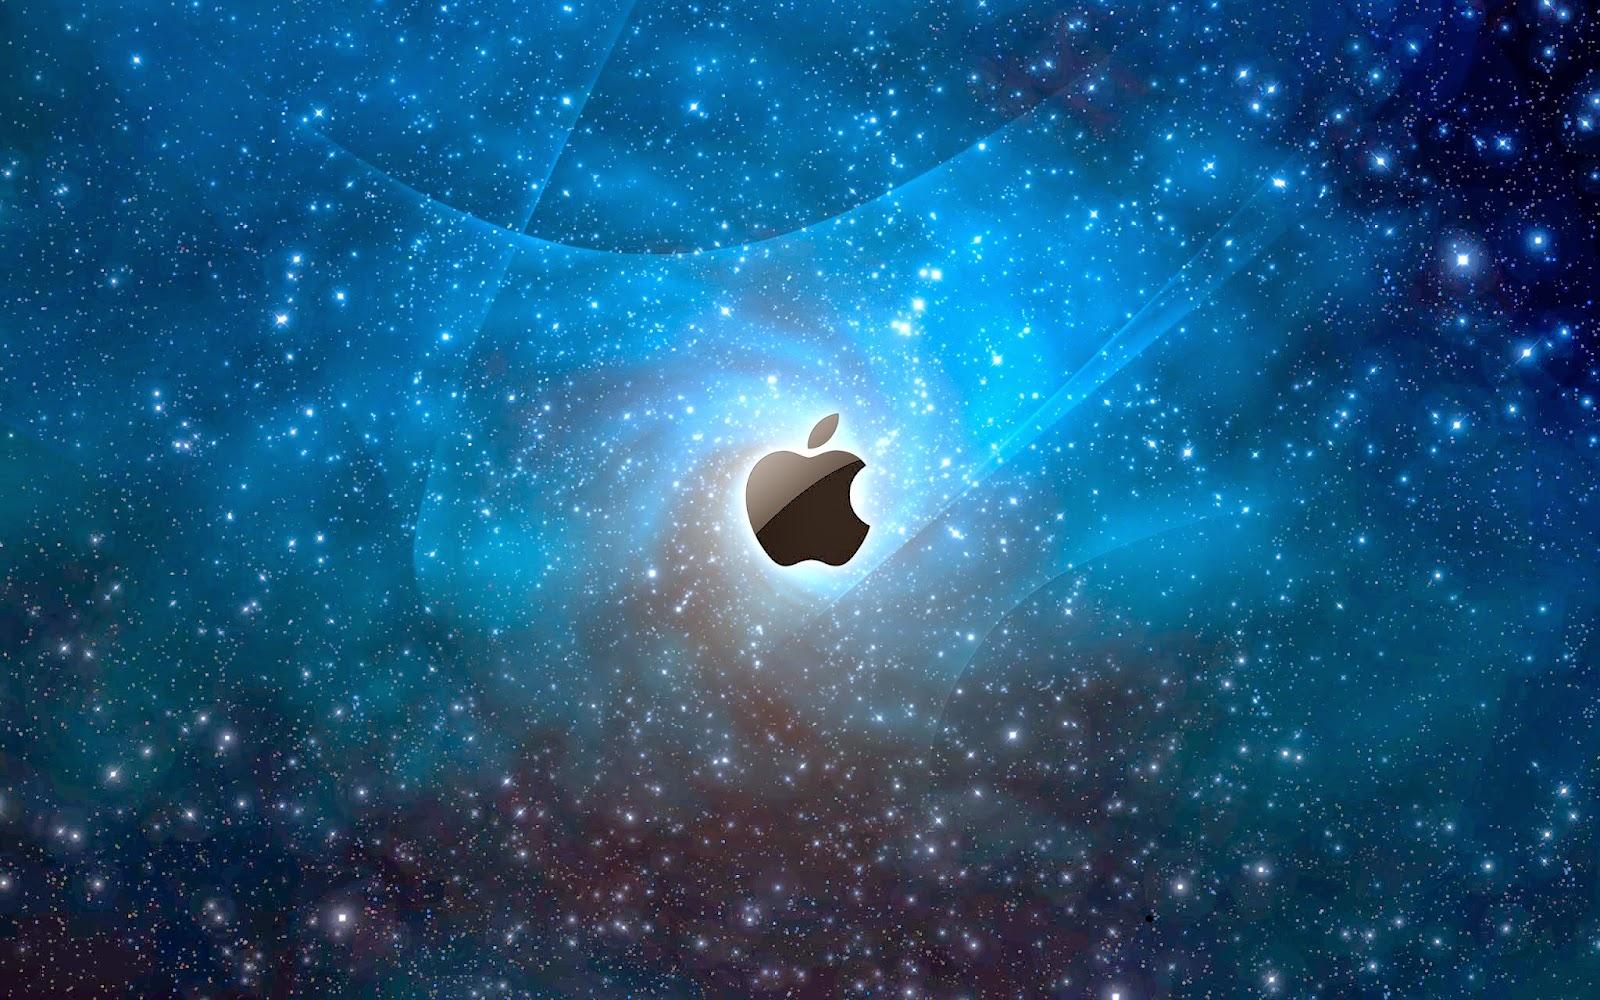 Apple new hd wallpaper wallpapers for Wallpaper new wallpaper